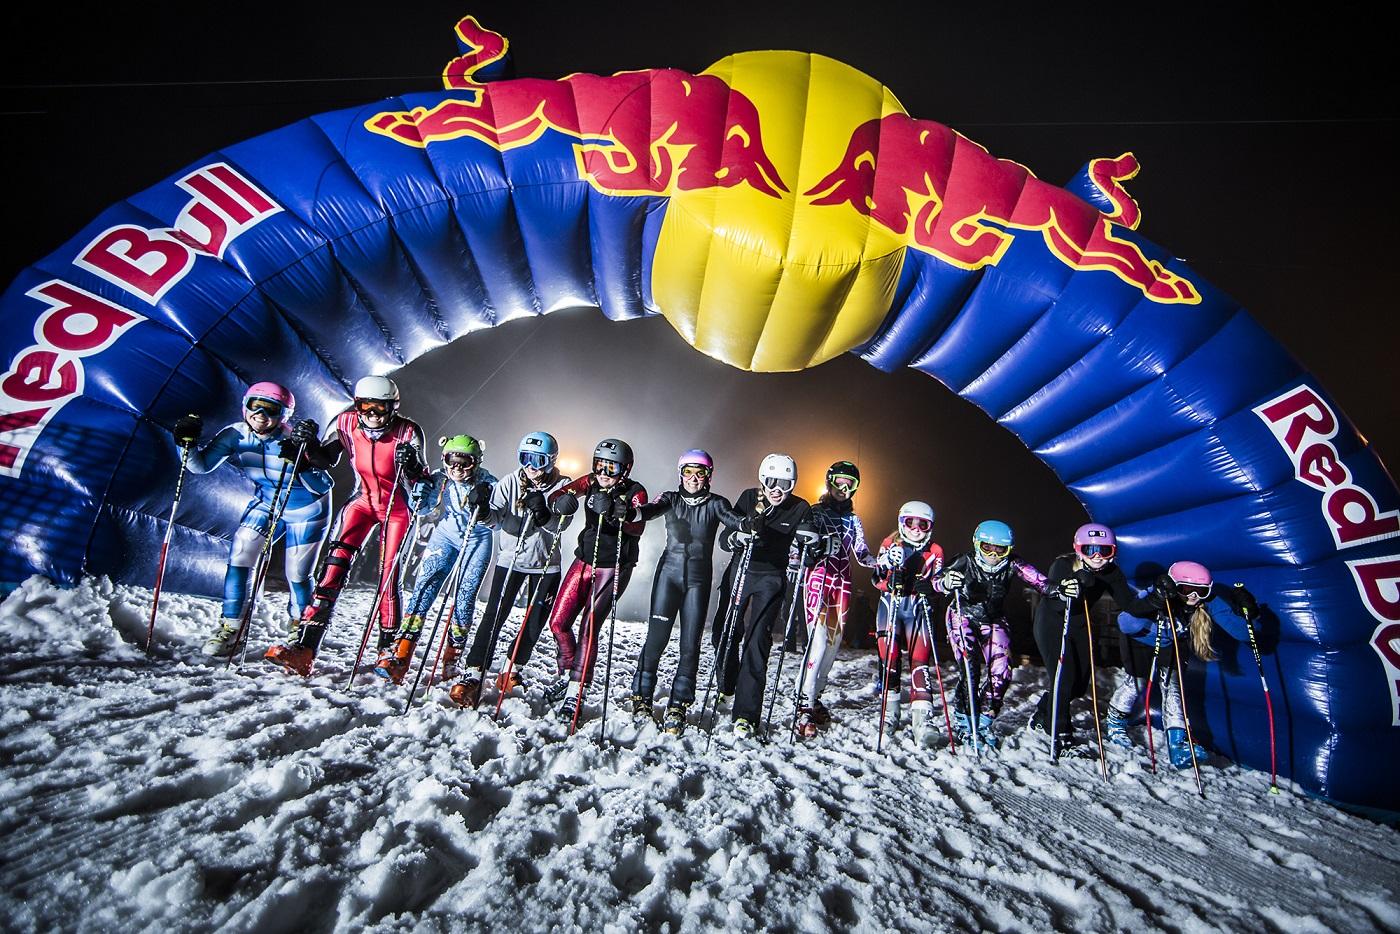 Red Bull_Content_Pool_Red_Bull_Zjazd_Na_Krech_Zakopane_fot._M_Kin_1